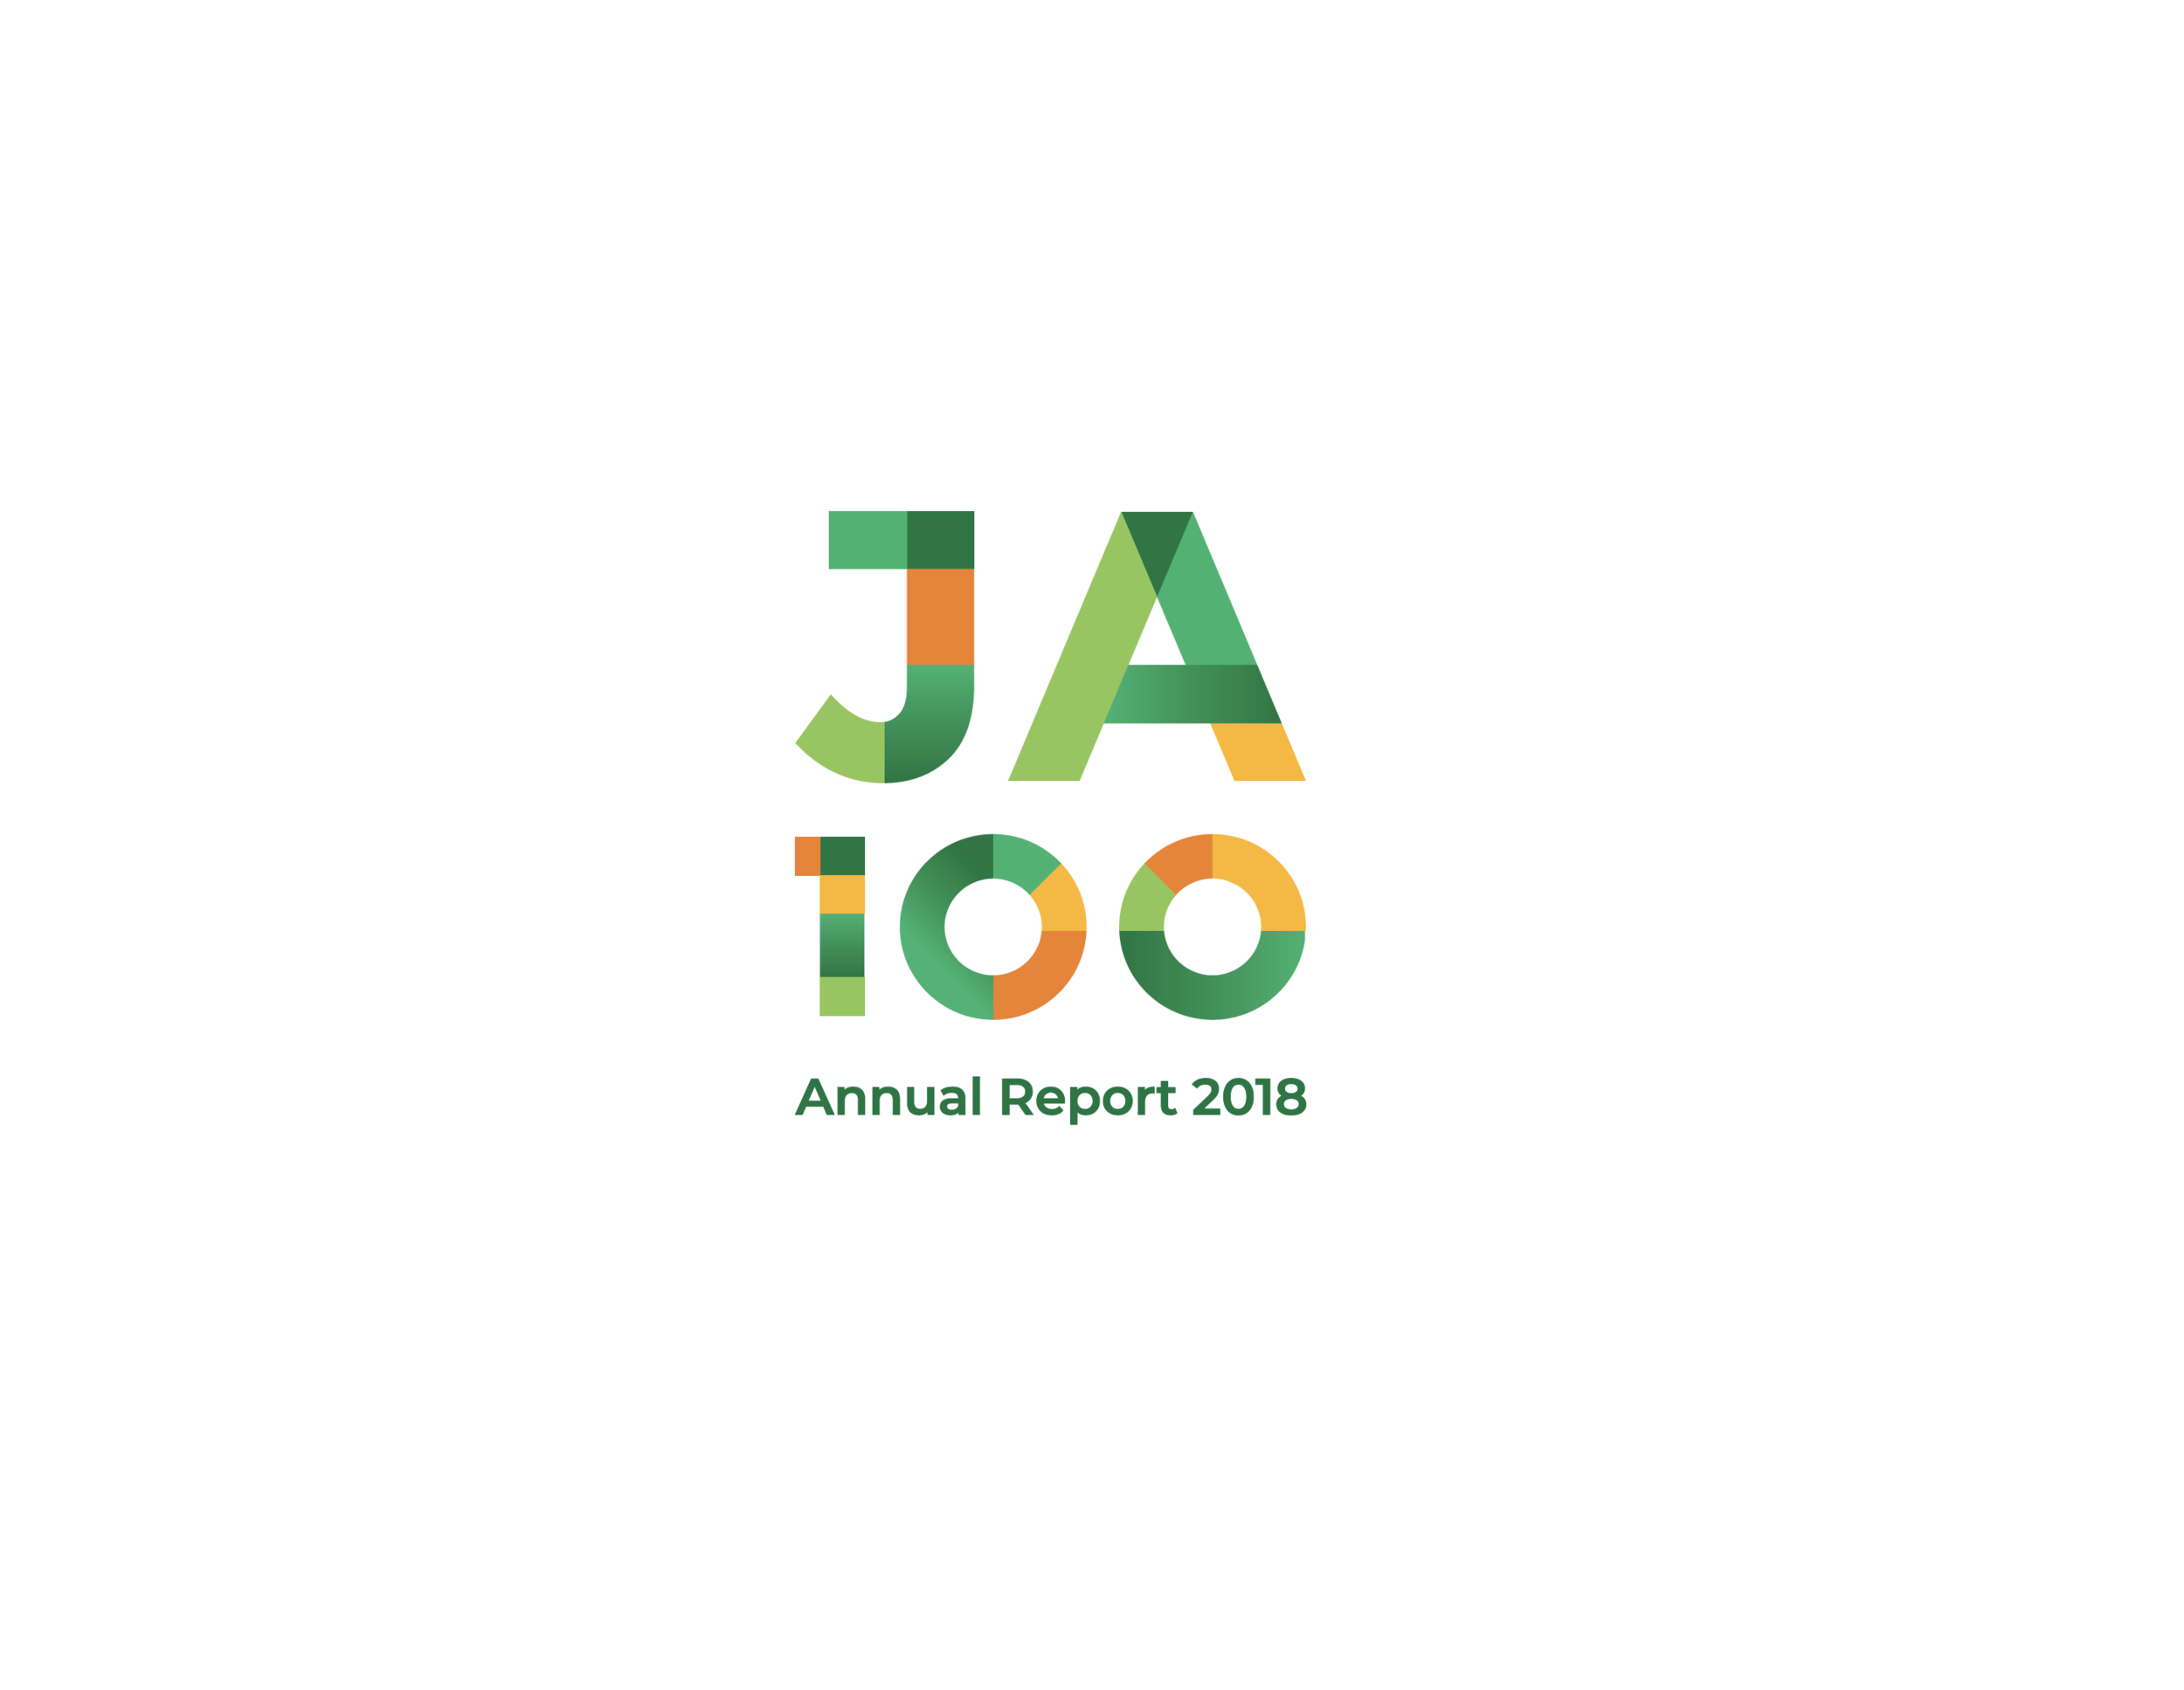 JA Worldwide Annual Report